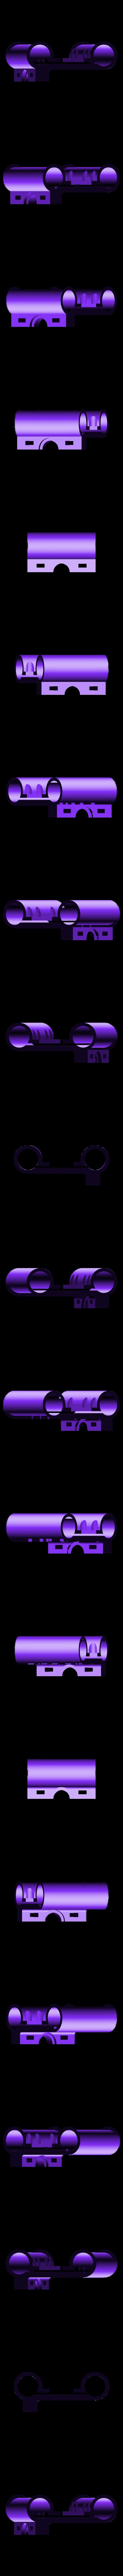 X_car.stl Download free STL file Portable 3D Printer • 3D printable design, Job